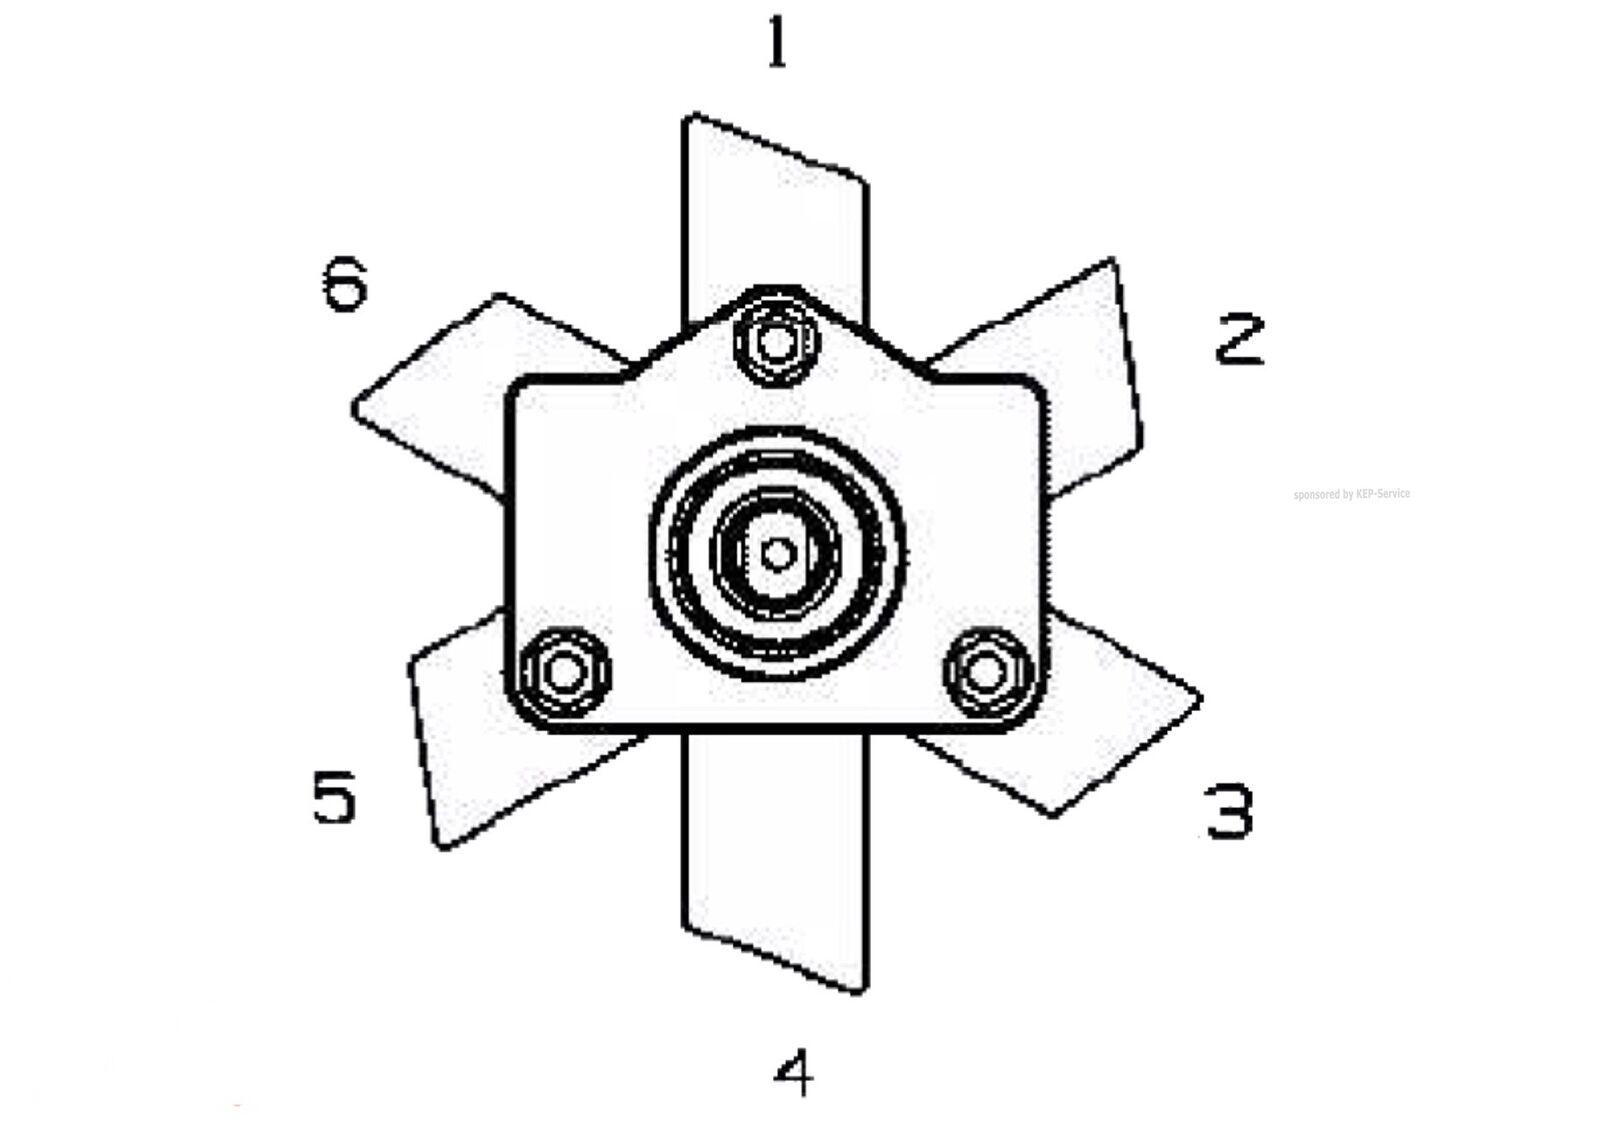 23x Grünikutiermesser MTD MTD MTD VG 45 B M BM MotorGrünikutierer Ersatzmesser VG45 | Online Shop Europe  | Elegant Und Würdevoll  ac455f